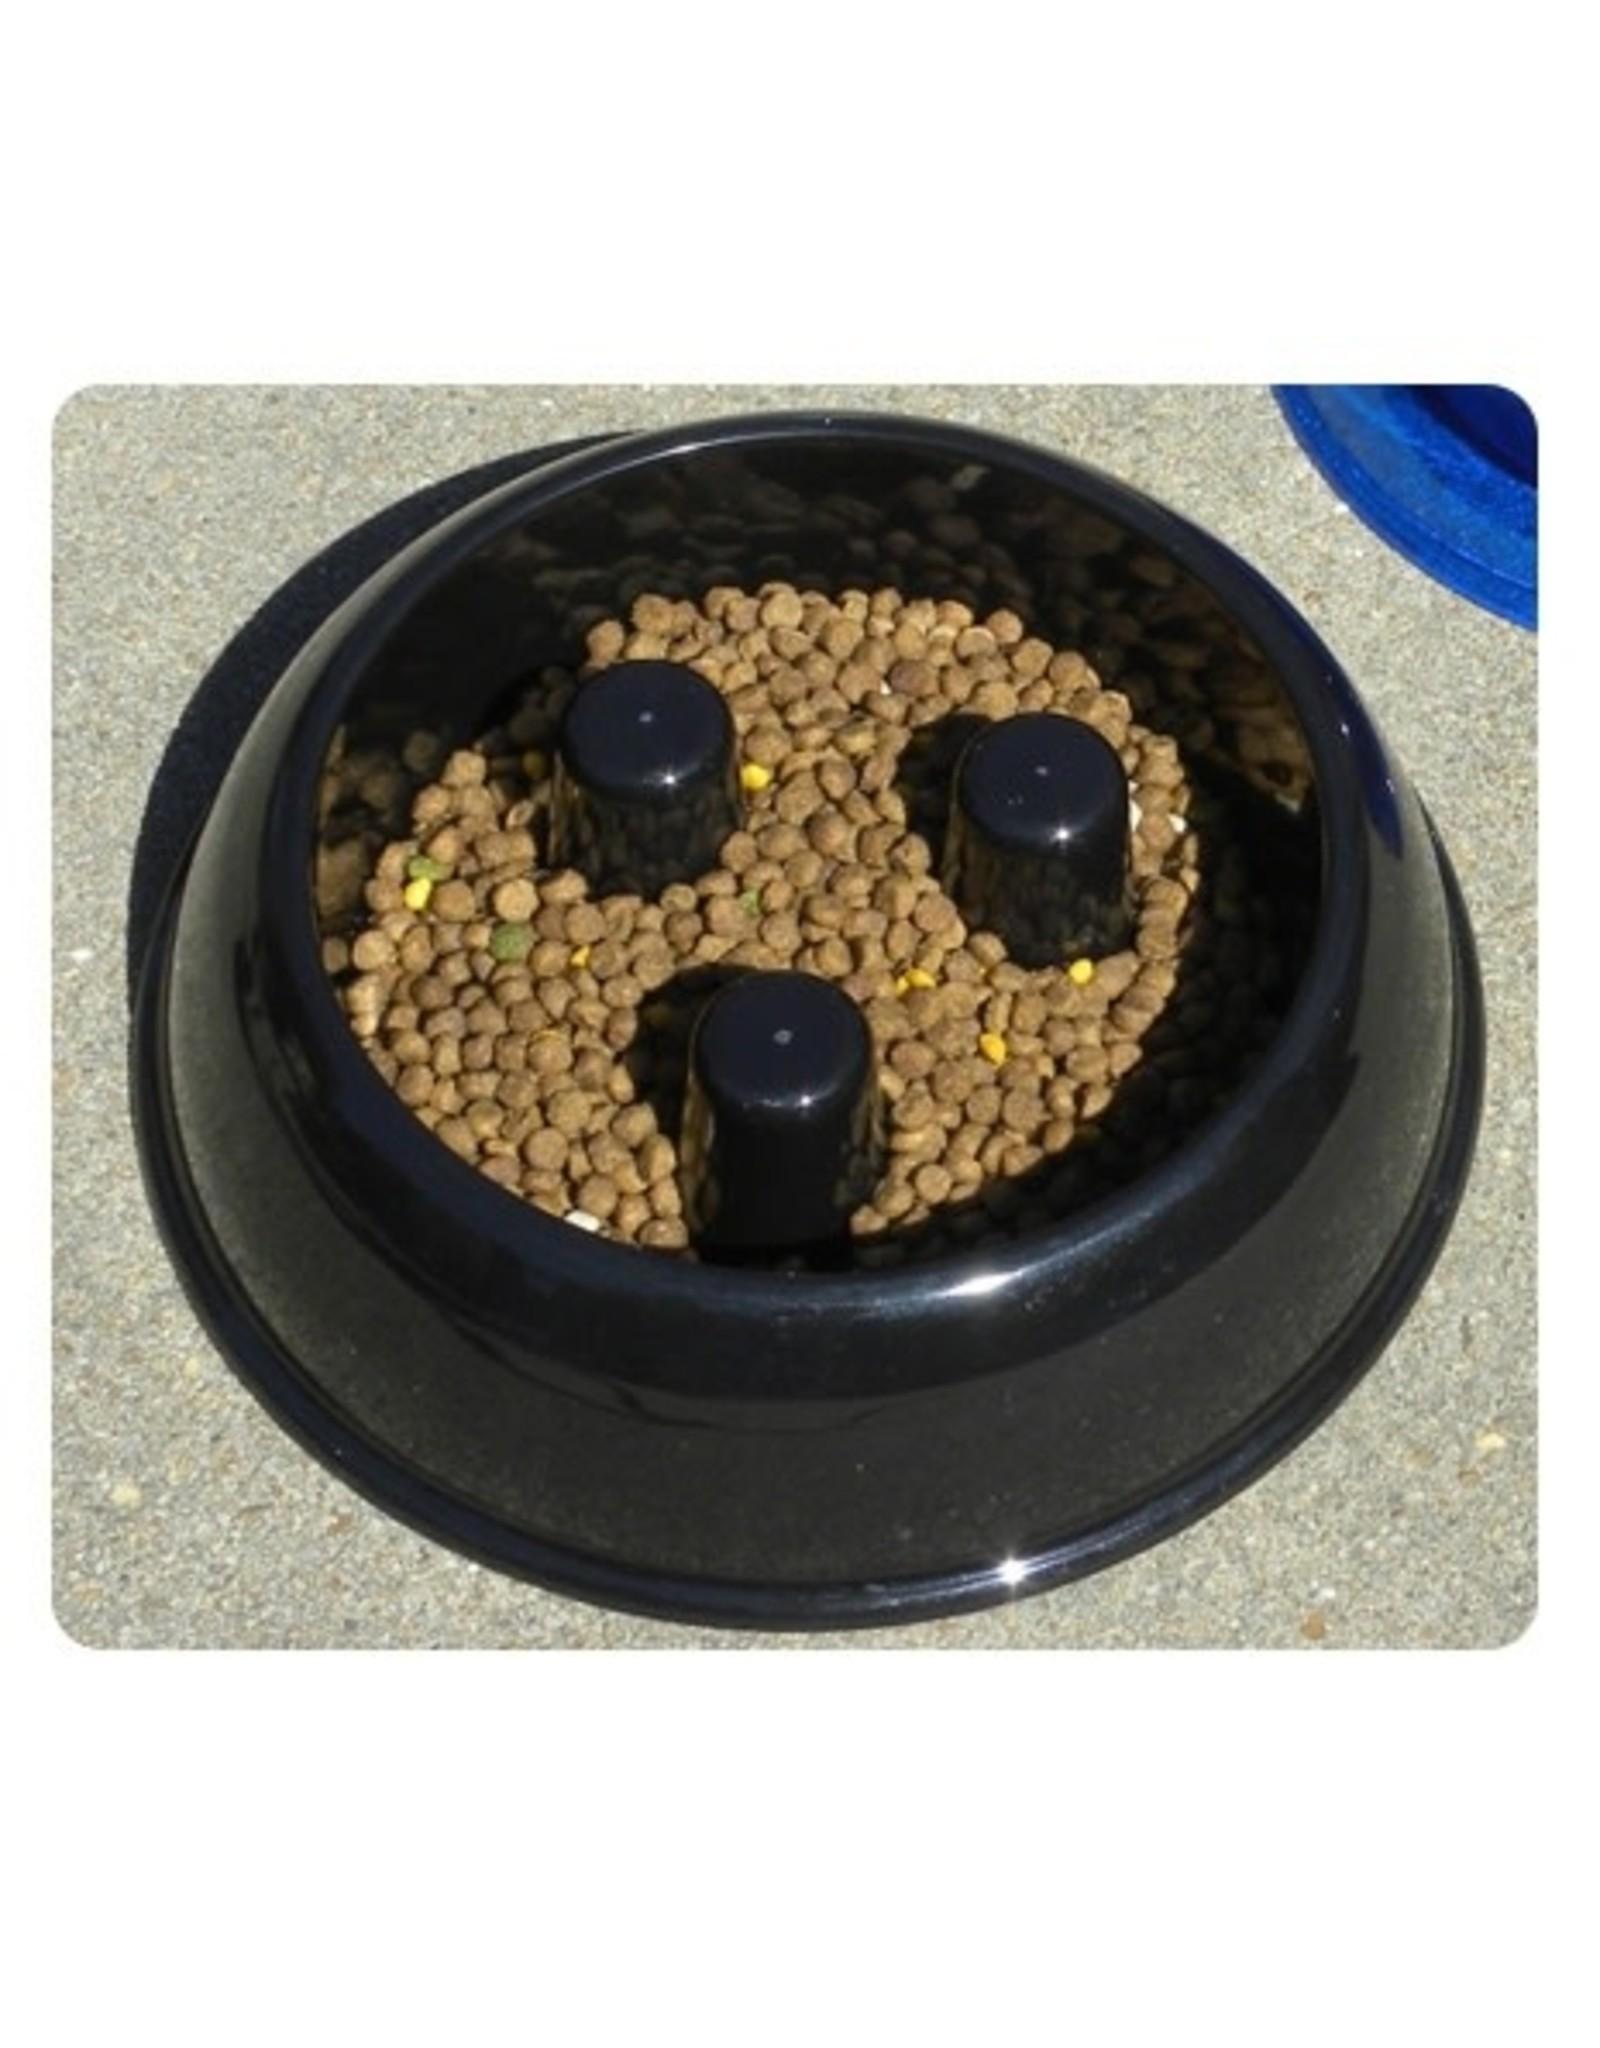 Brake-Fast brake-fast Bowls: Black, L